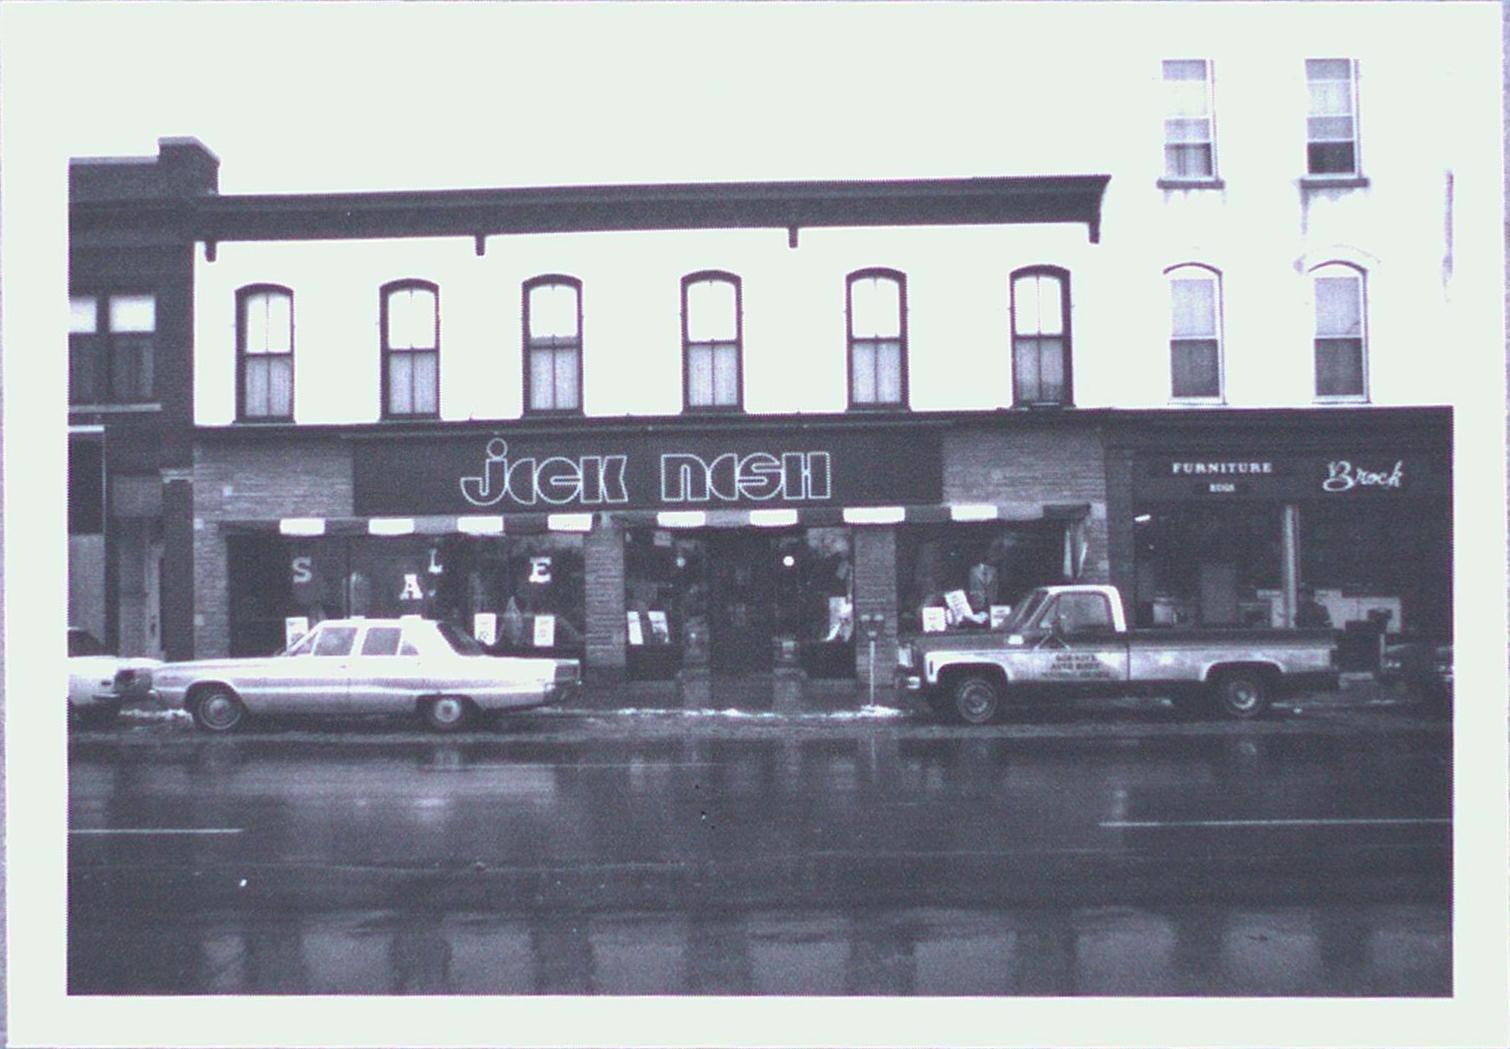 Jack Nash, 300 St. Paul Street